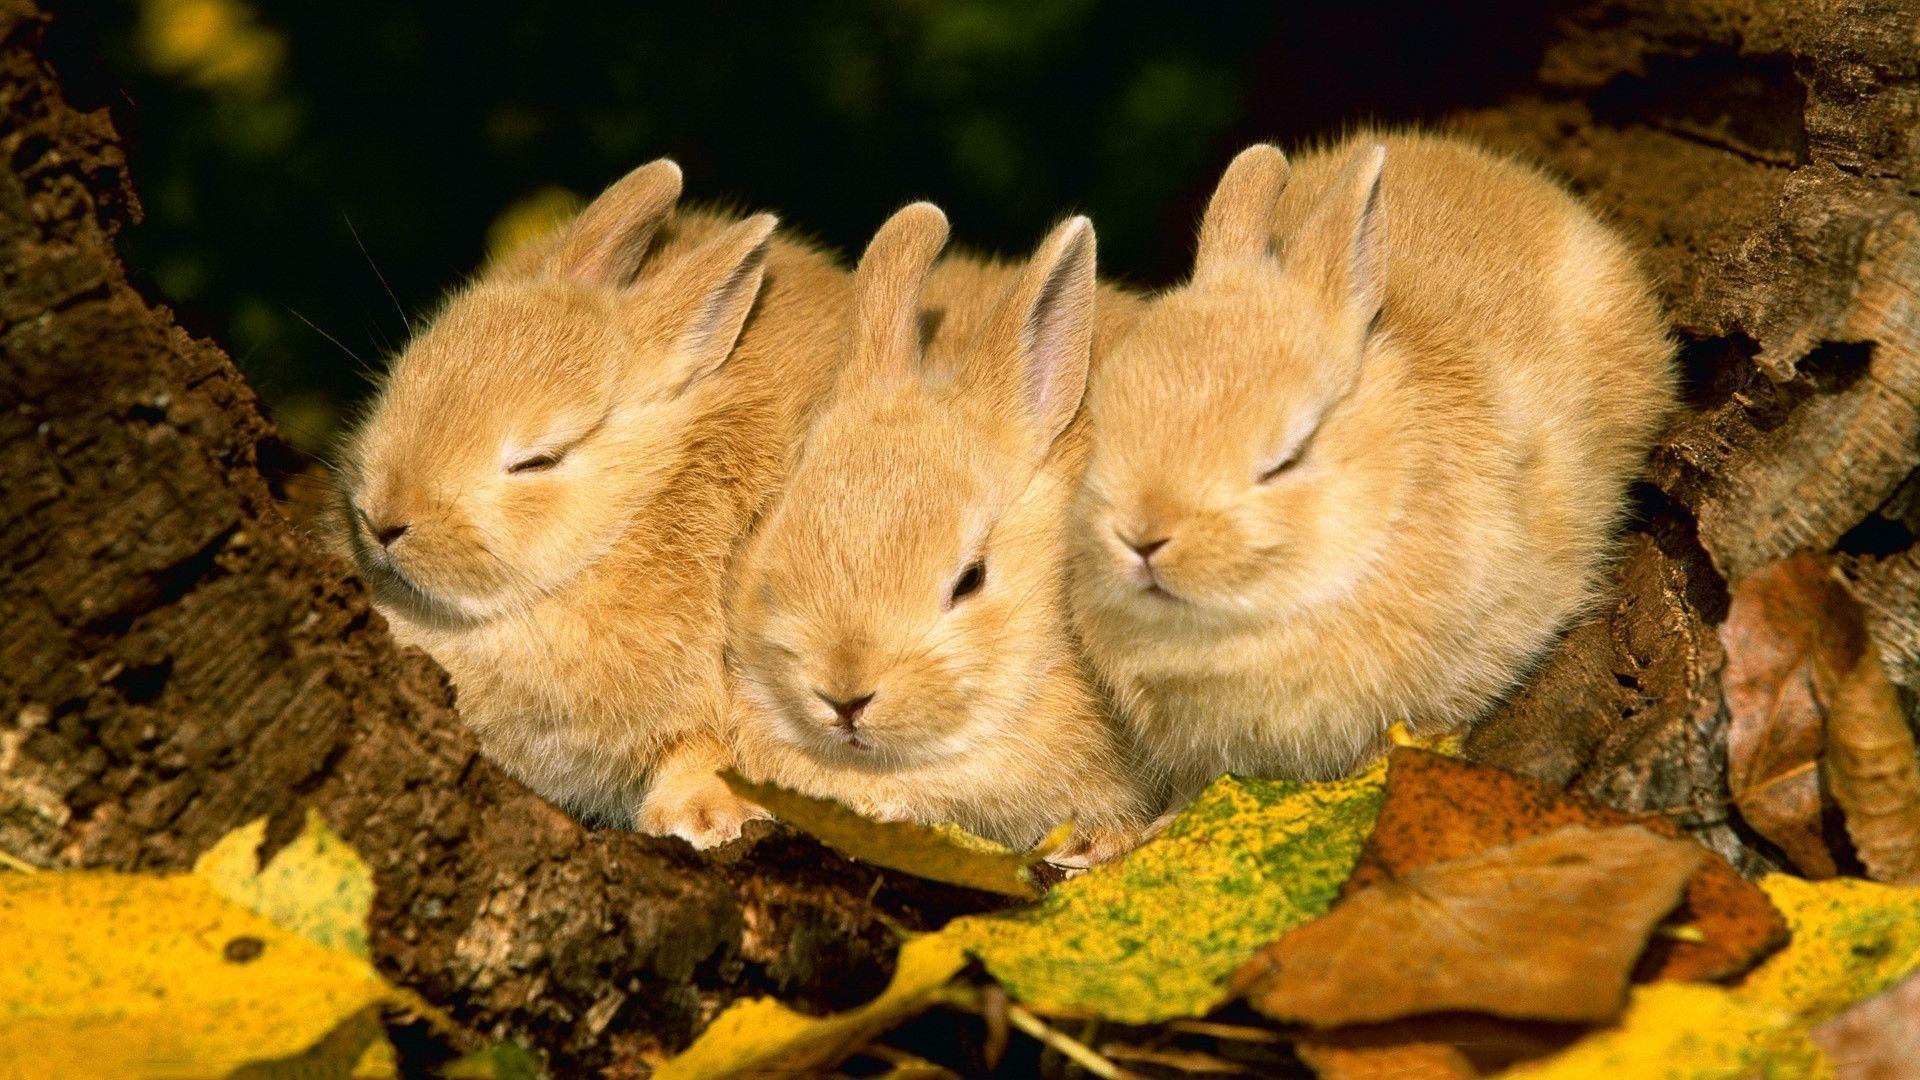 Sleeping bunnies Wallpaper